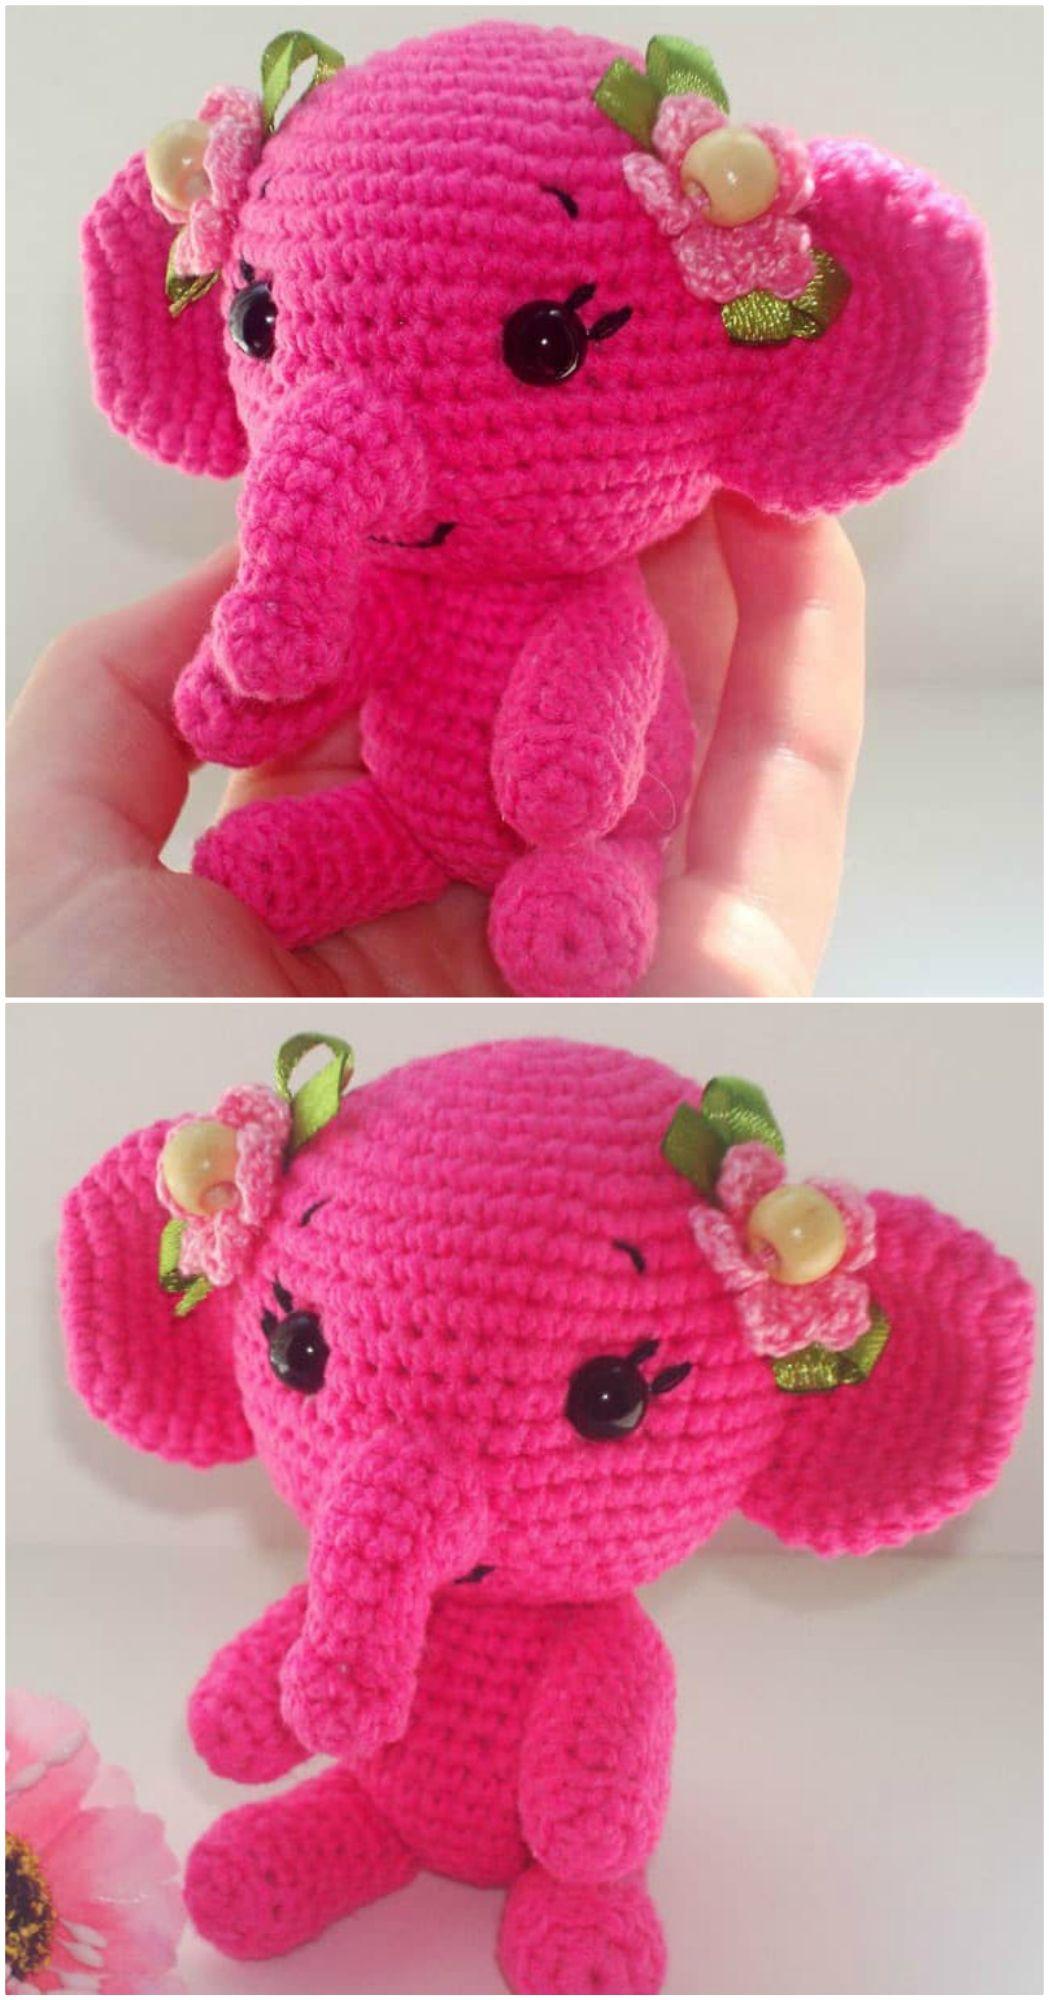 Crochet Elephant Amigurumi Easy Video Instructions Toys